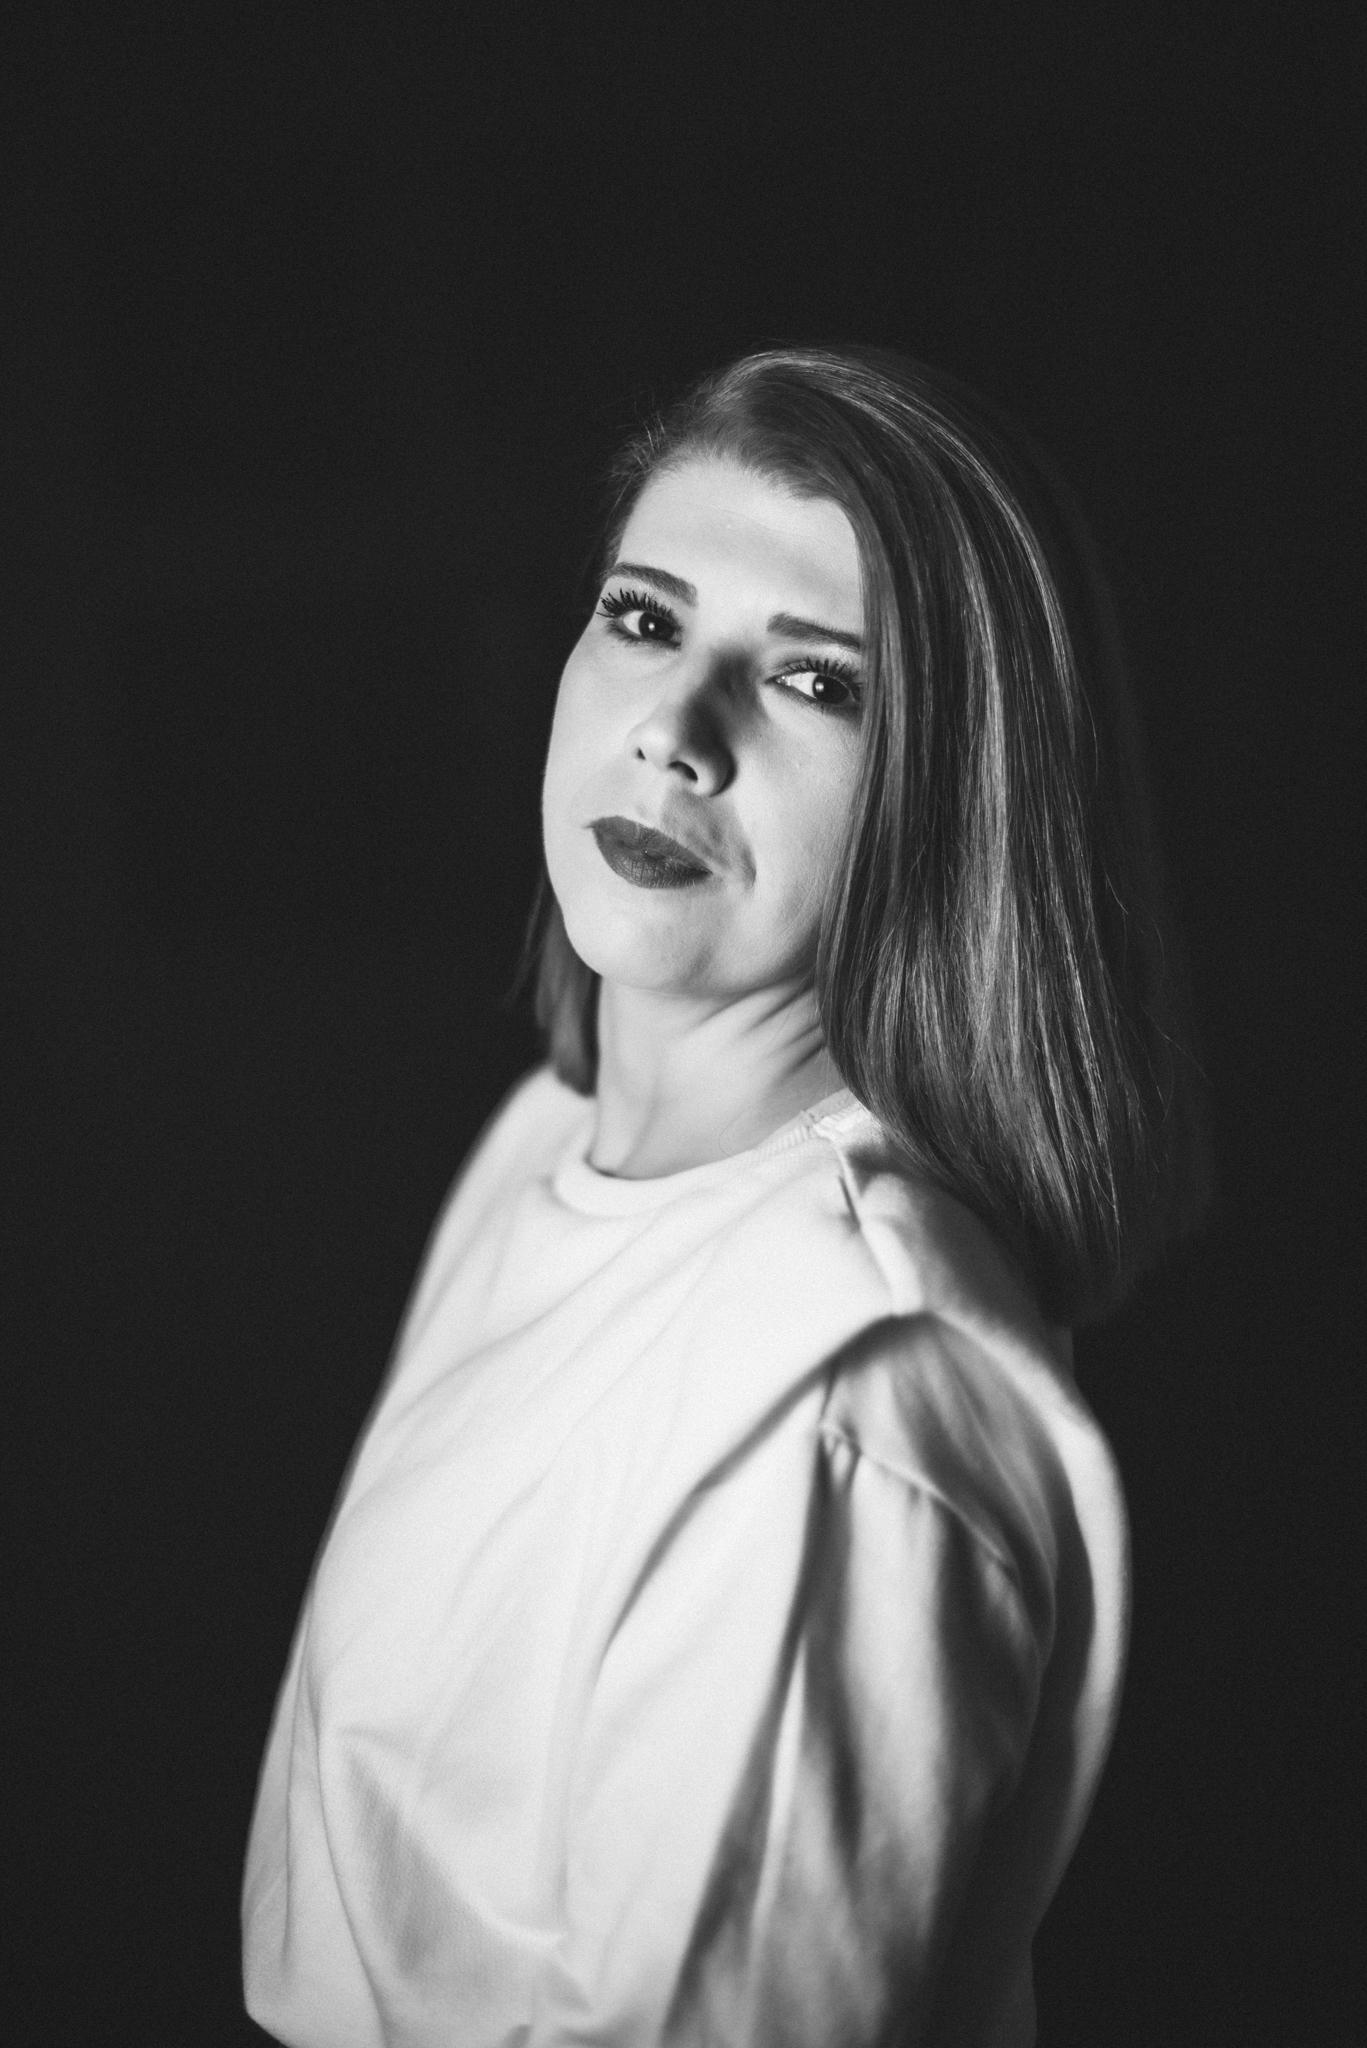 Interviu de: Adriana Moscu